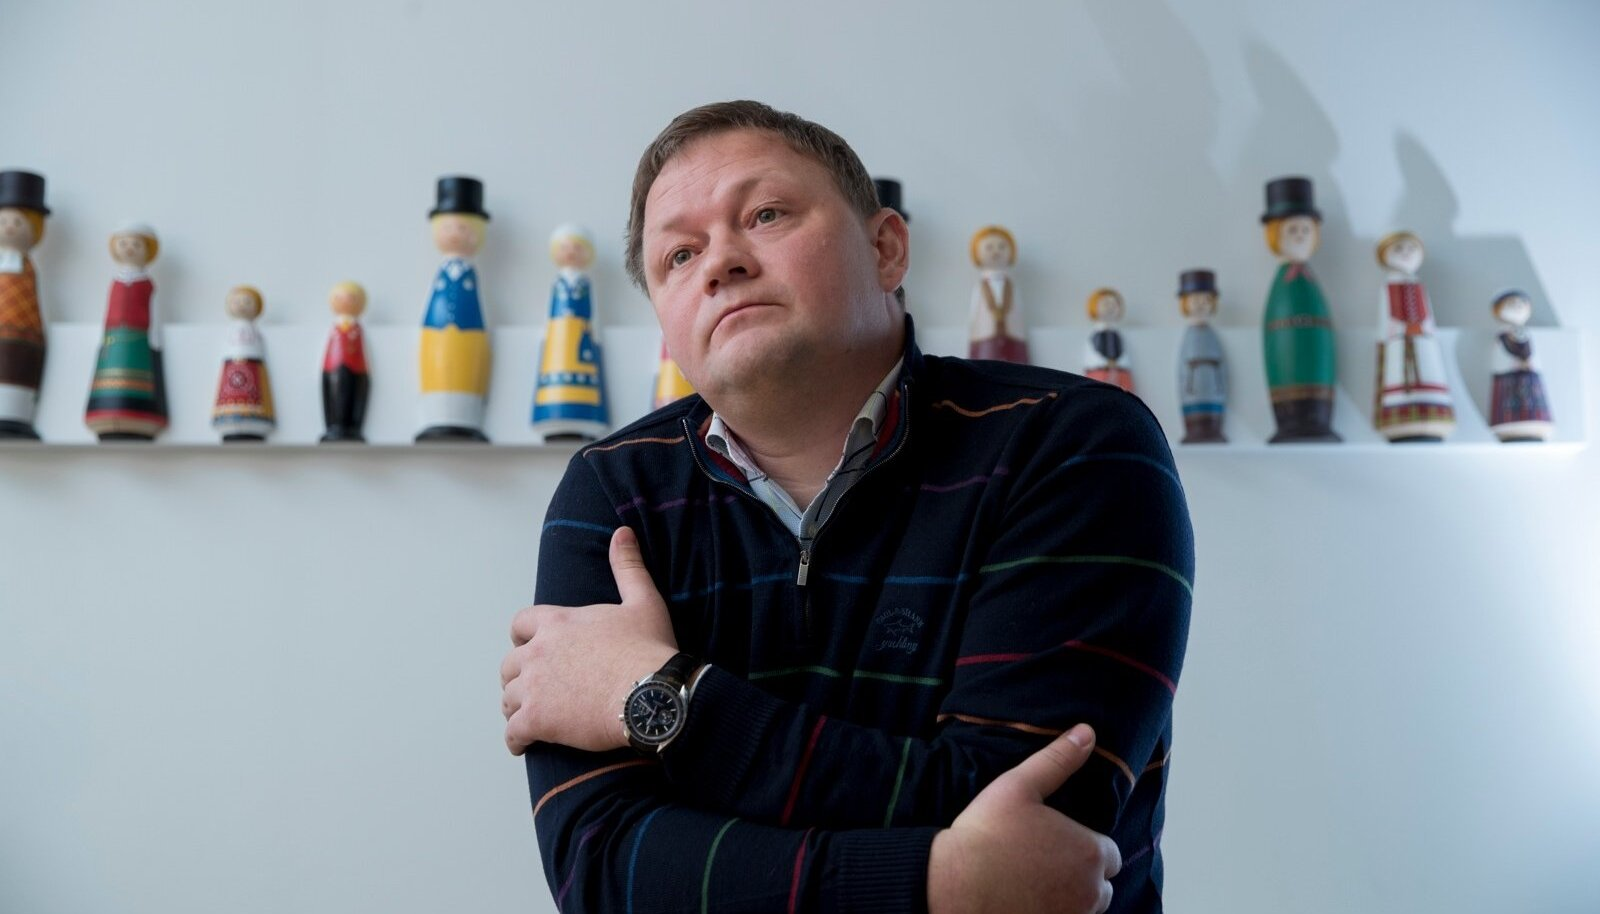 MURED BELGIAS: Graanul Investi omanik ja juhtRaul Kirjanen.